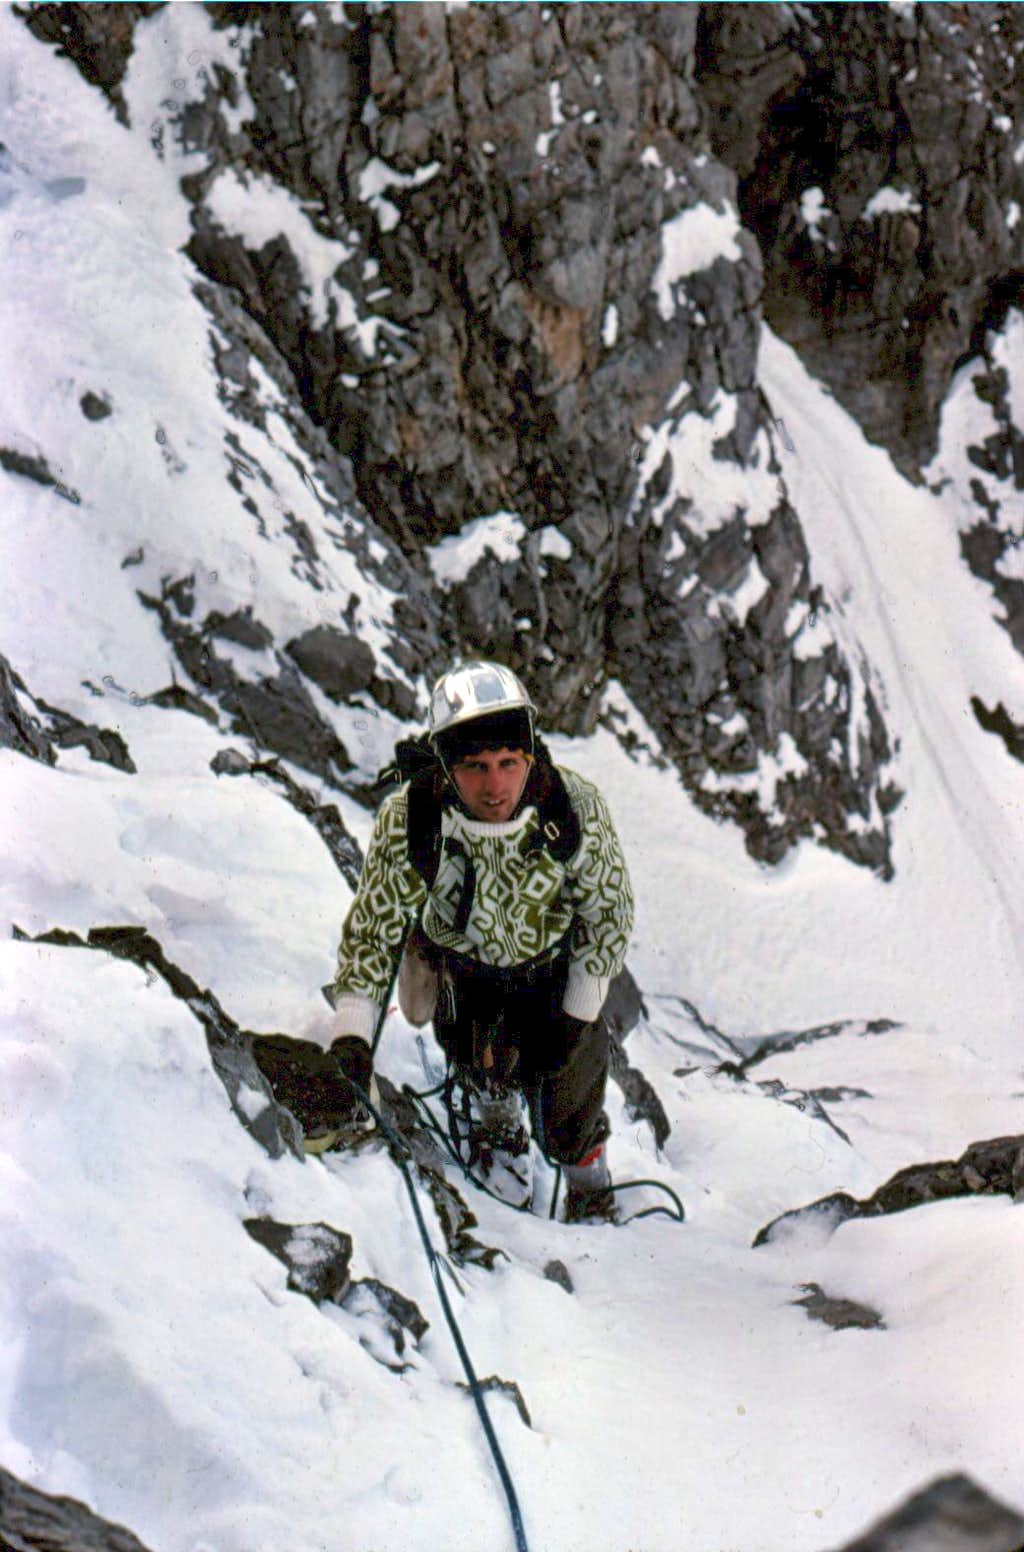 North Face Direct - Mt Borah